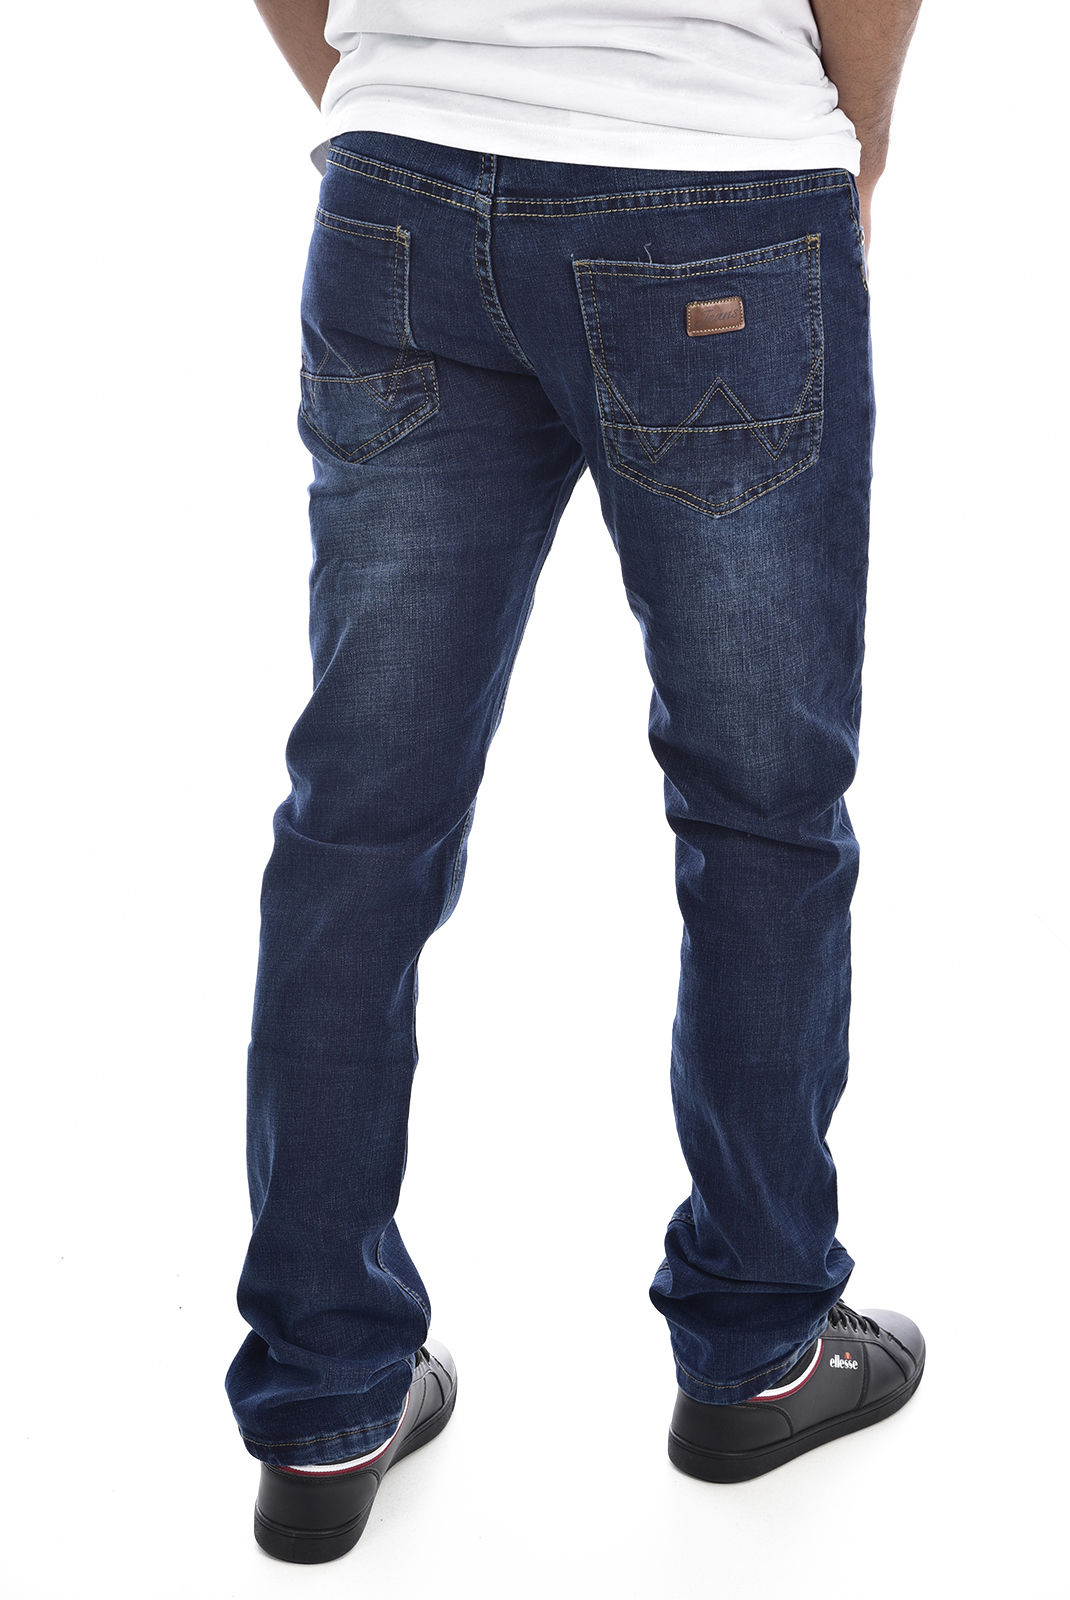 Jeans  Giani 5 C223 BLEU